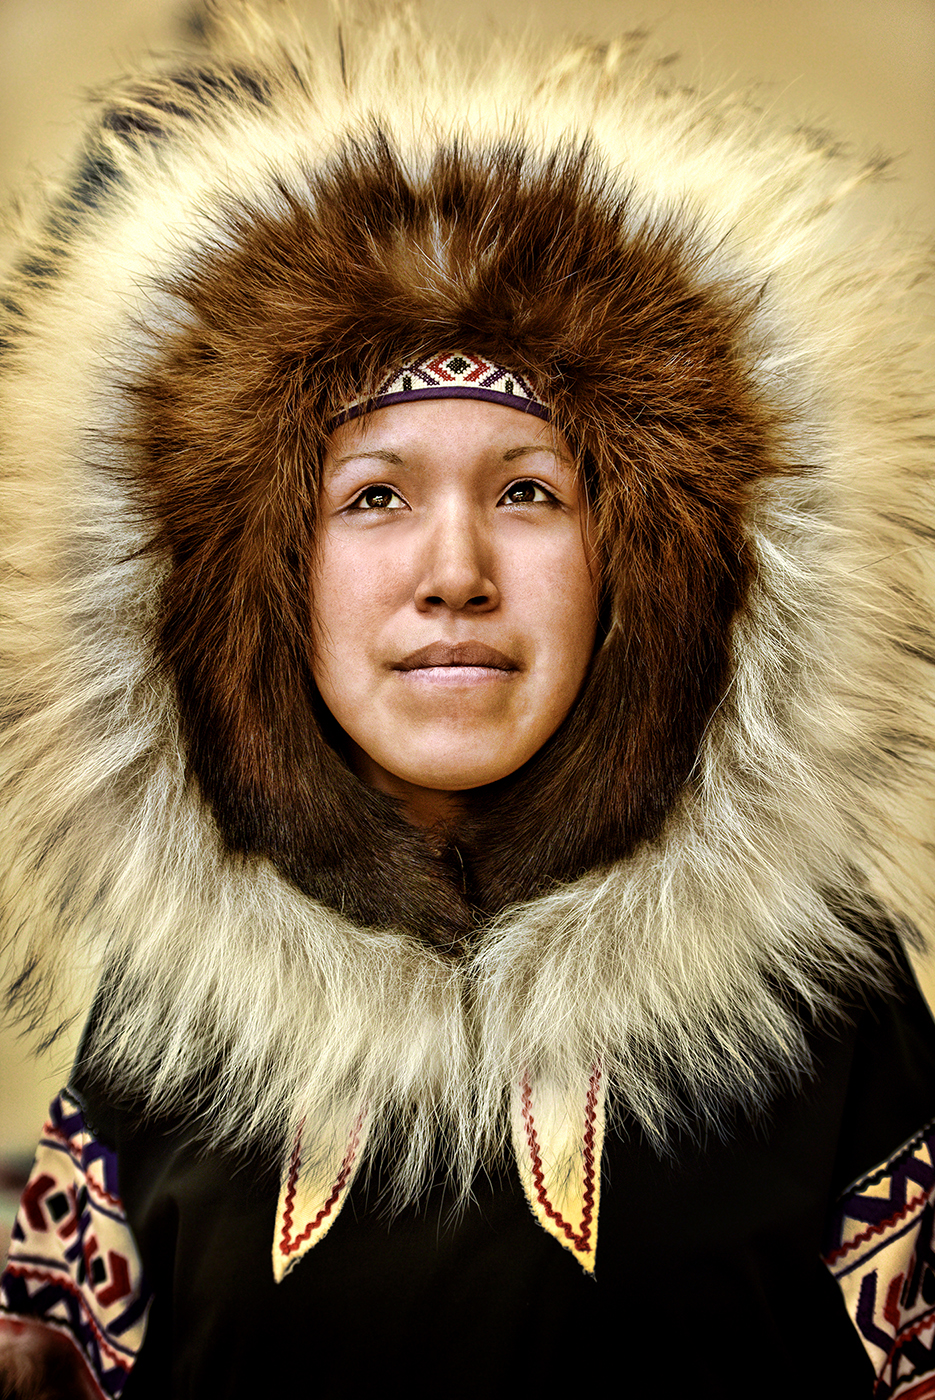 Inuk portrait, Cambridge Bay, Nunavut, September 2014